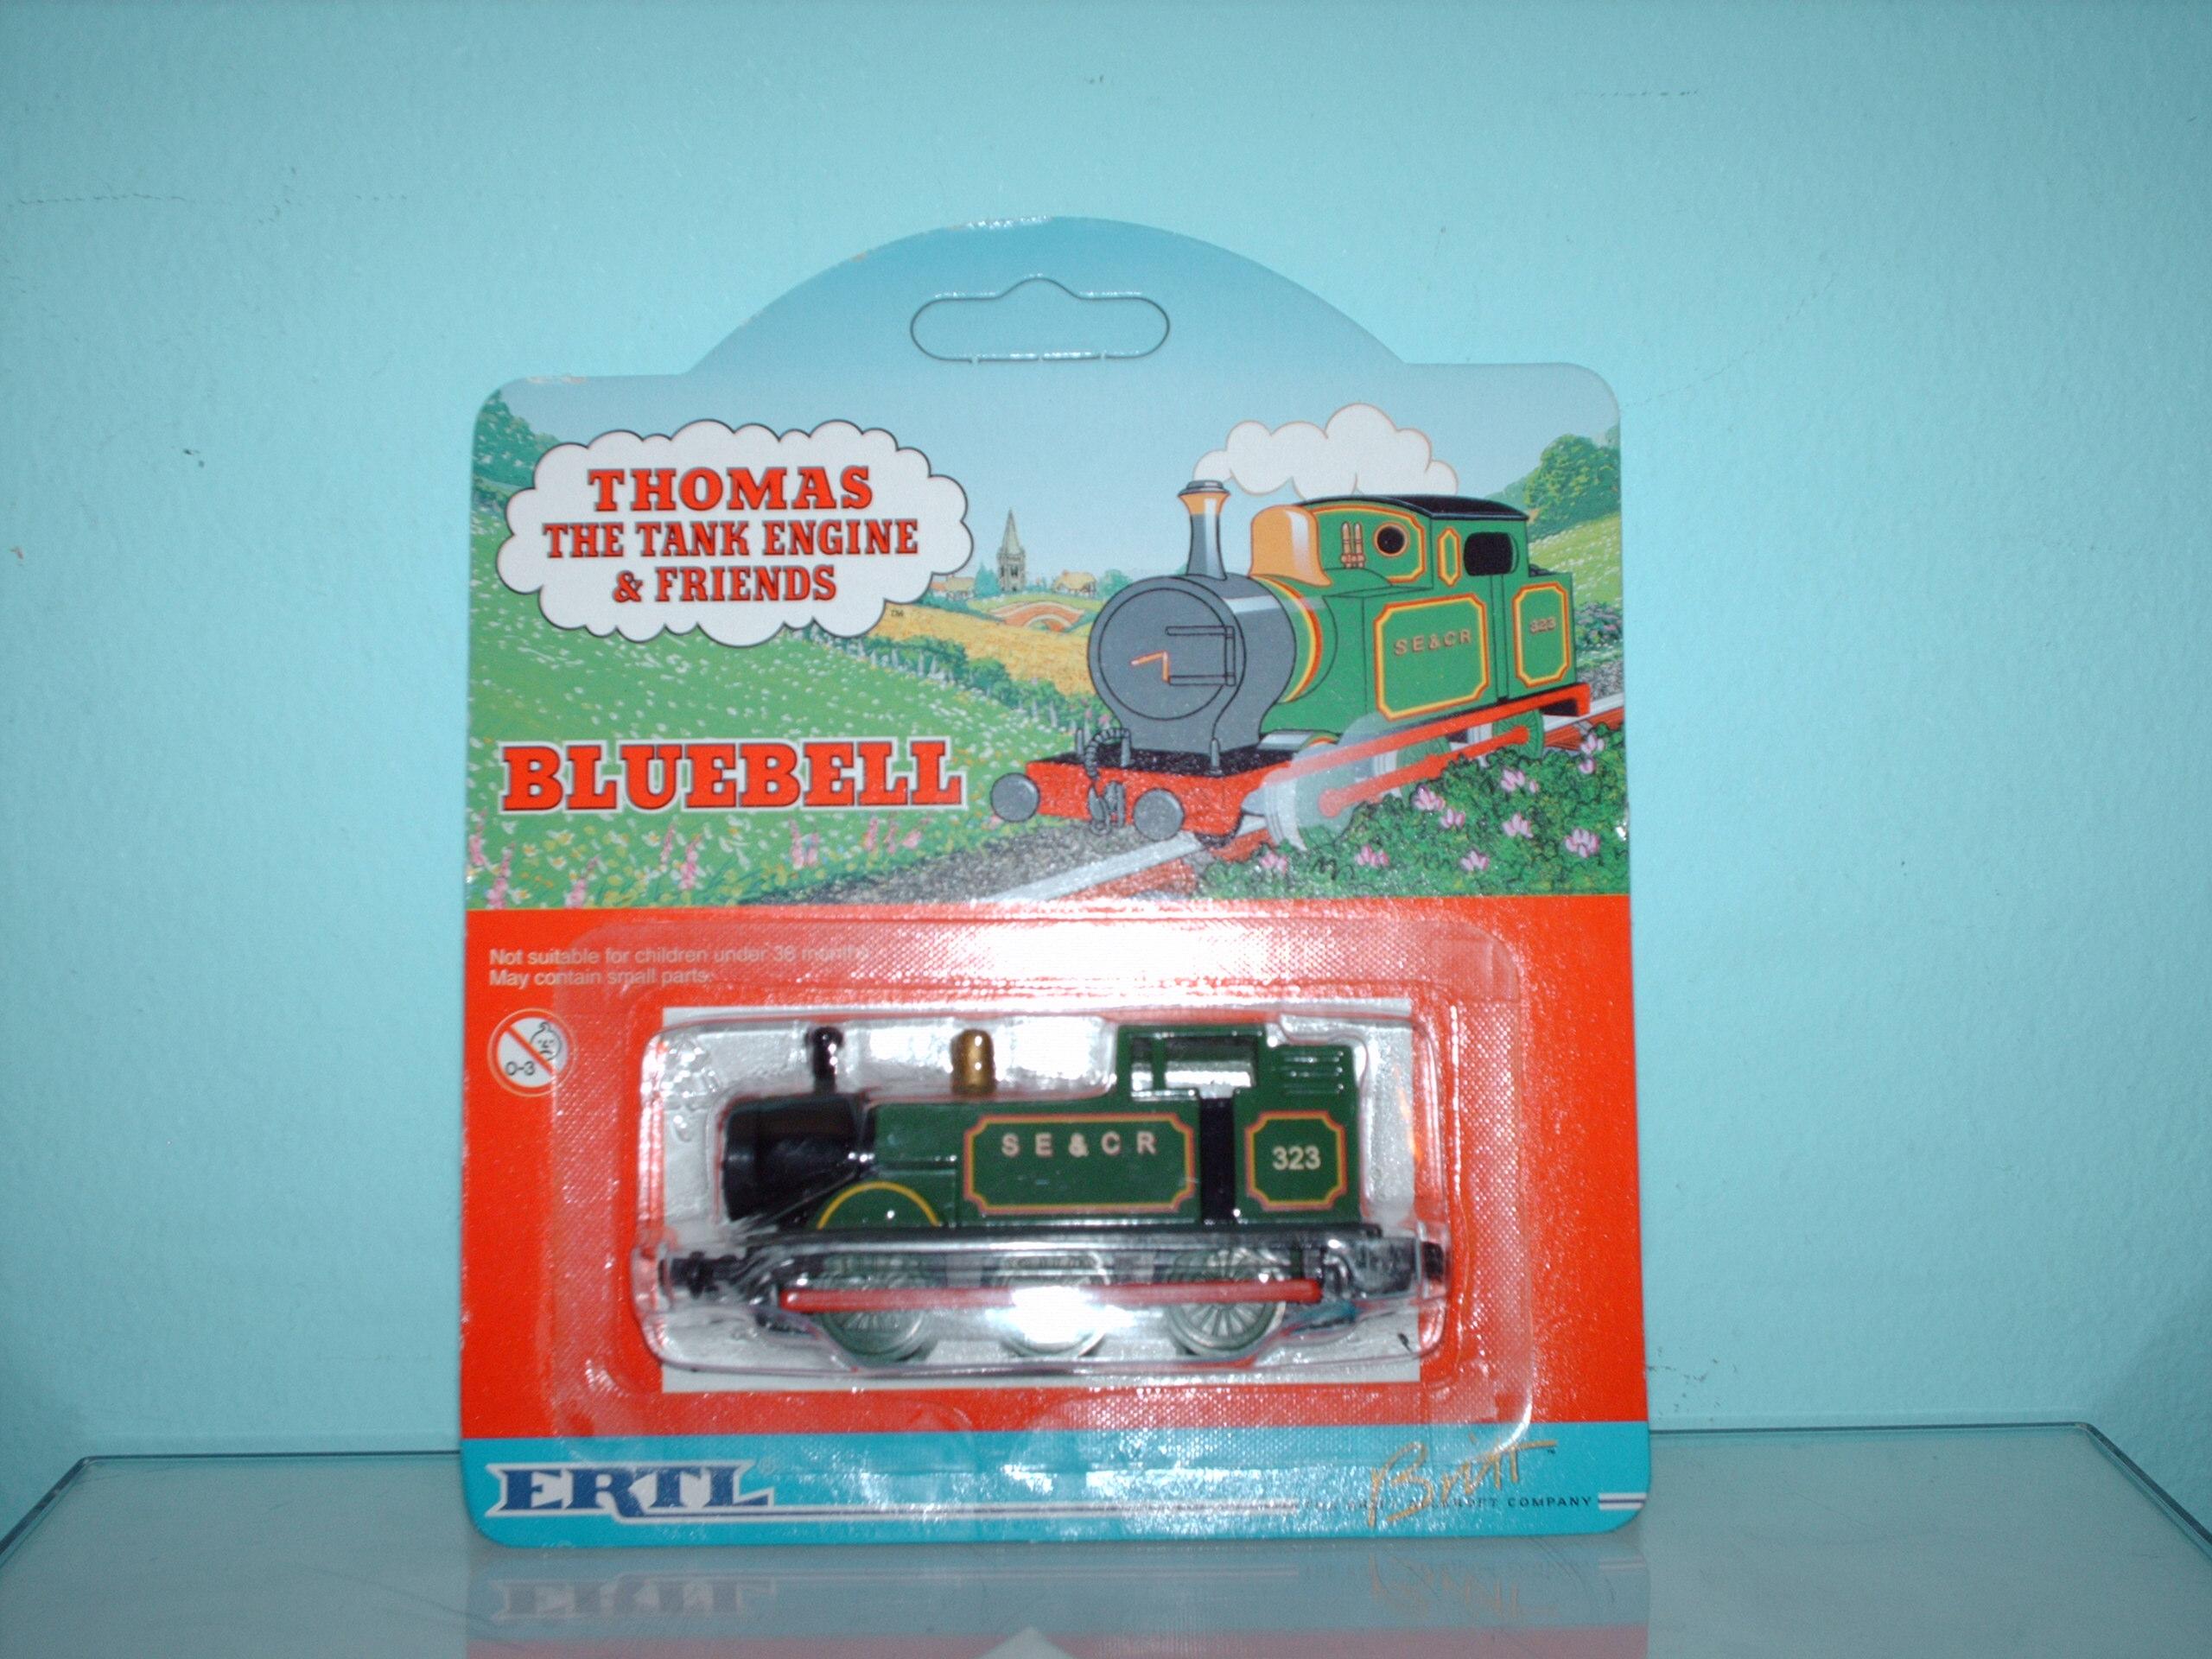 ERTL Thomas The Tank Engine & Friends Godred Train • £16 ... |Thomas The Tank Engine Ertl